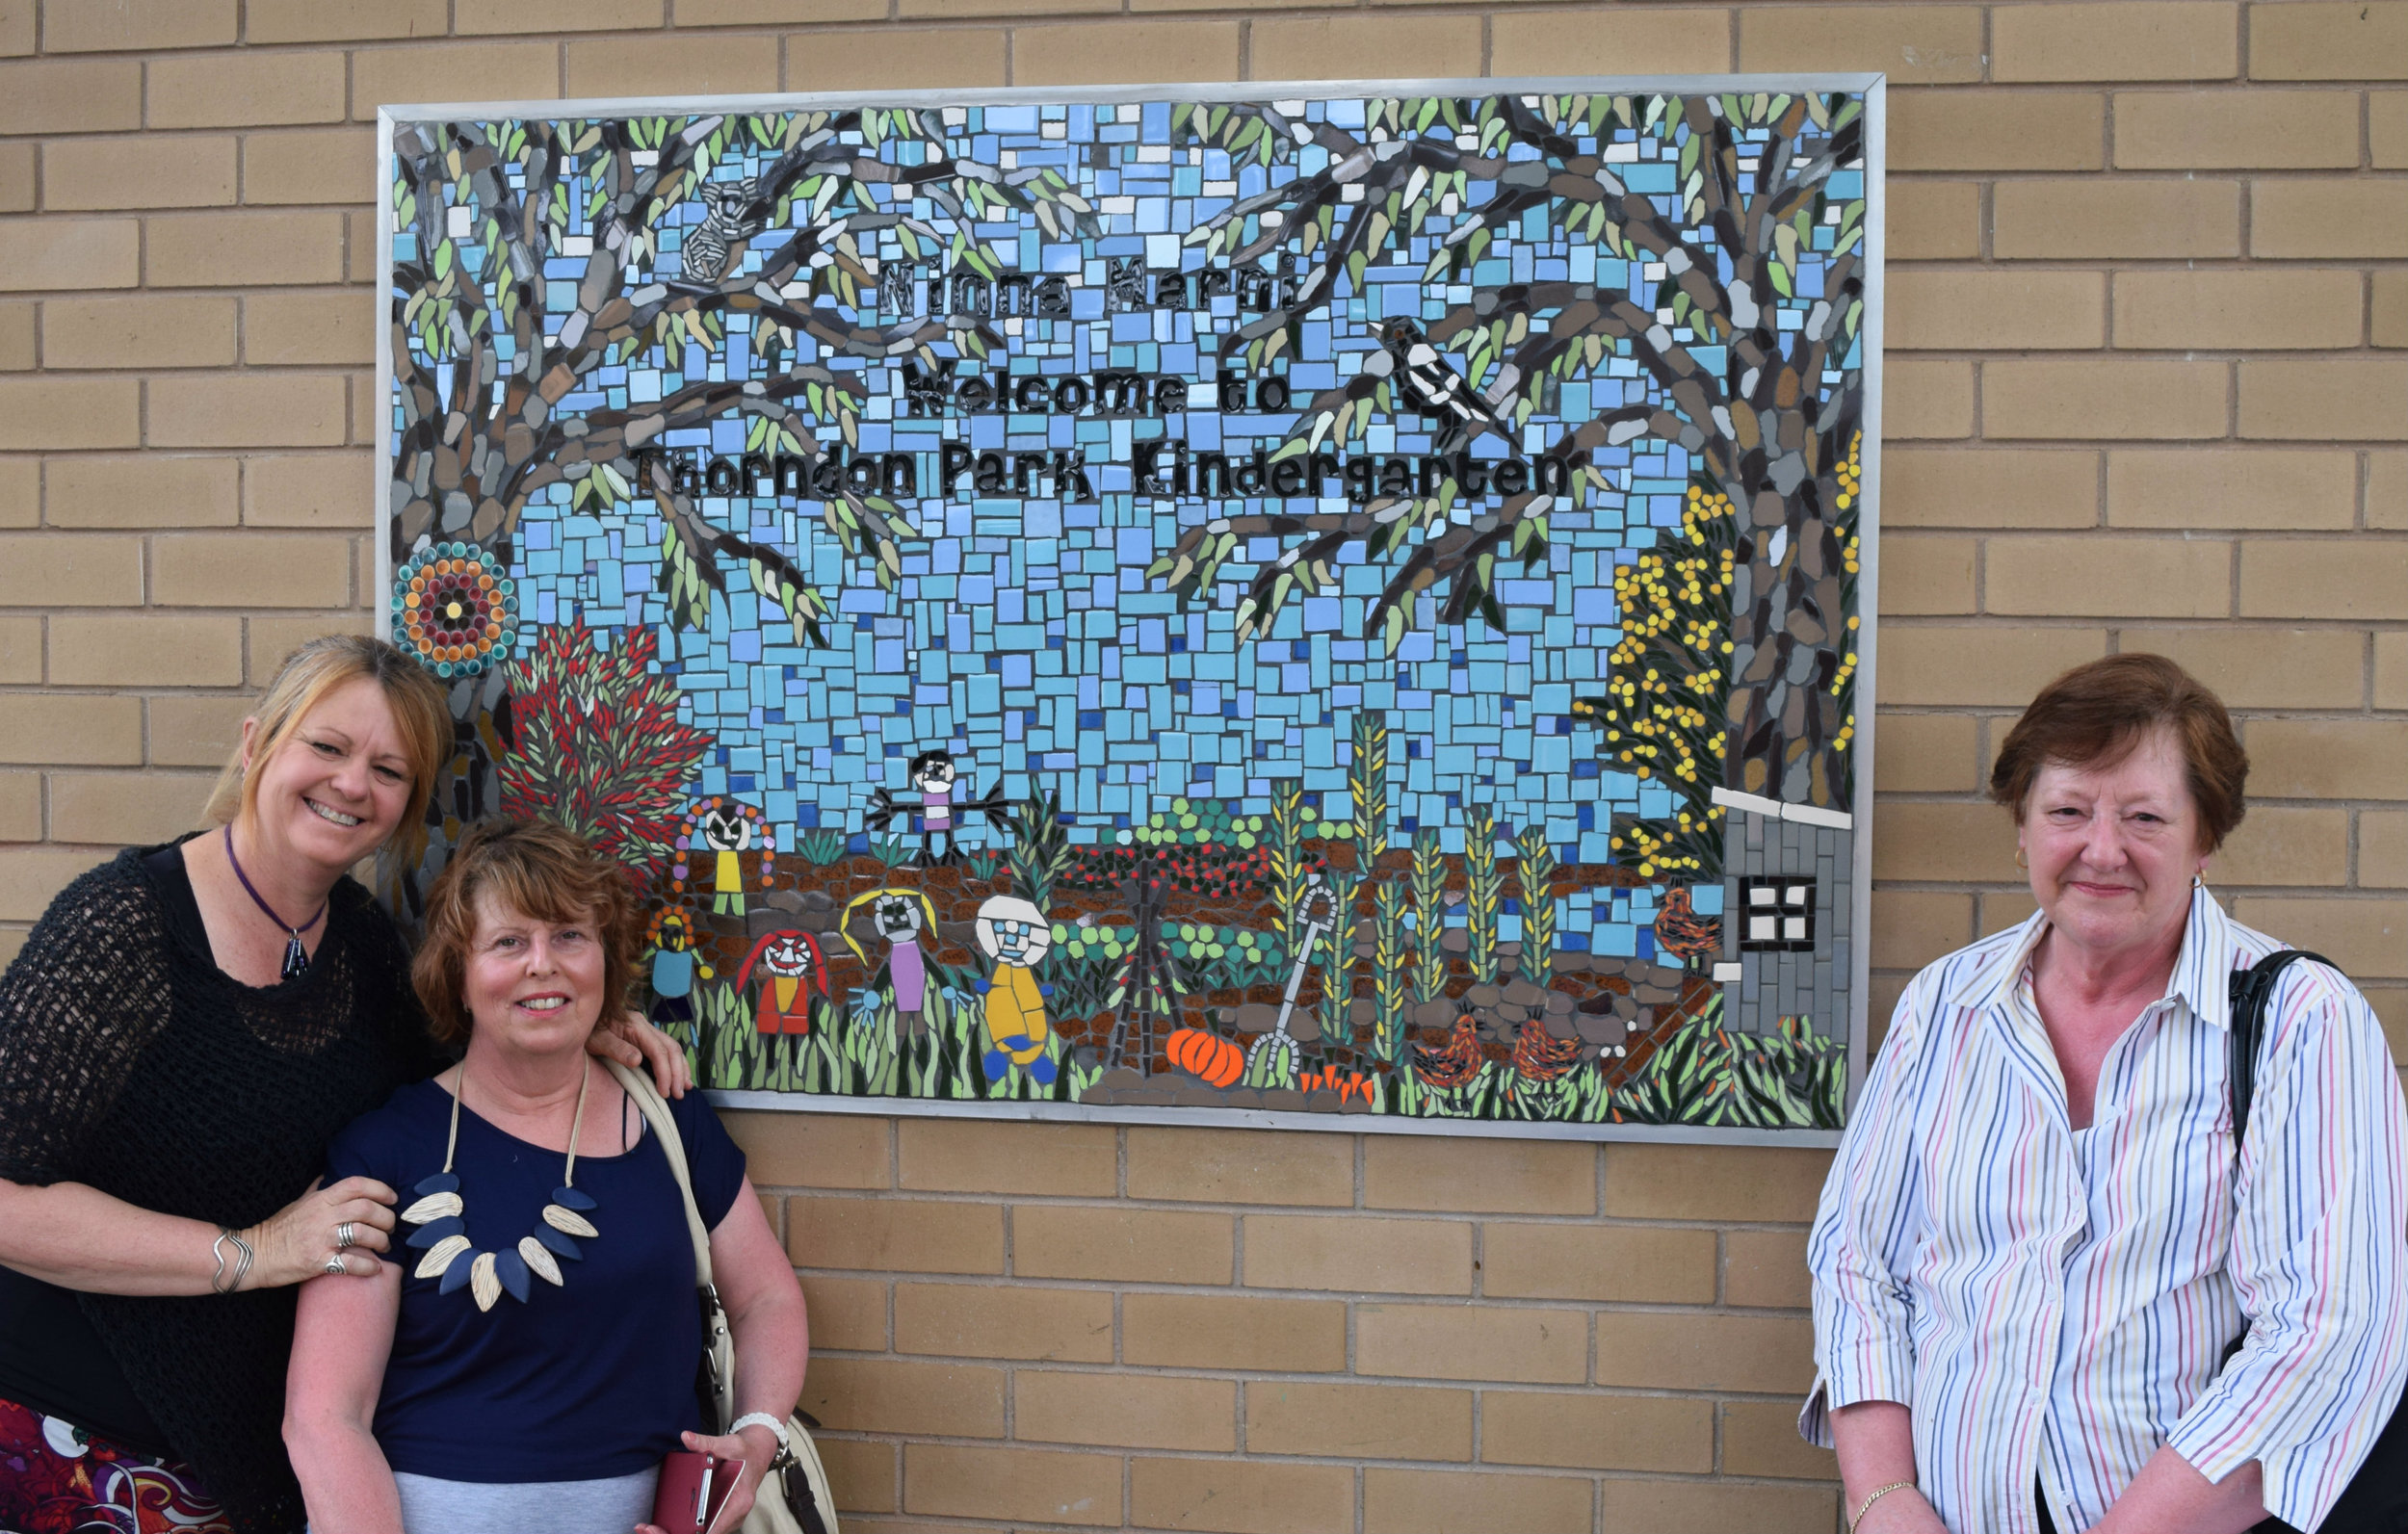 Thorndon Park Kindergarten Mosaic (pictured with my wonderful volunteers)